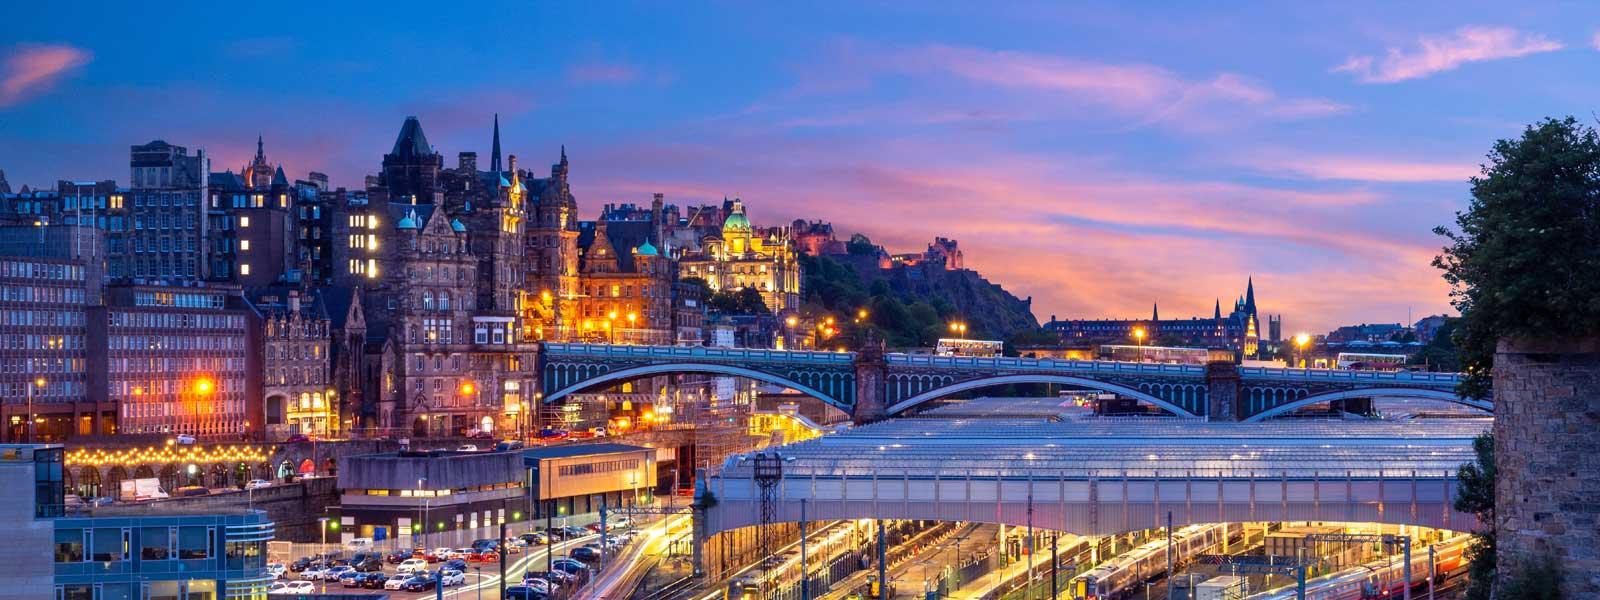 Beautiful evening view of Edinburgh Waverley Station